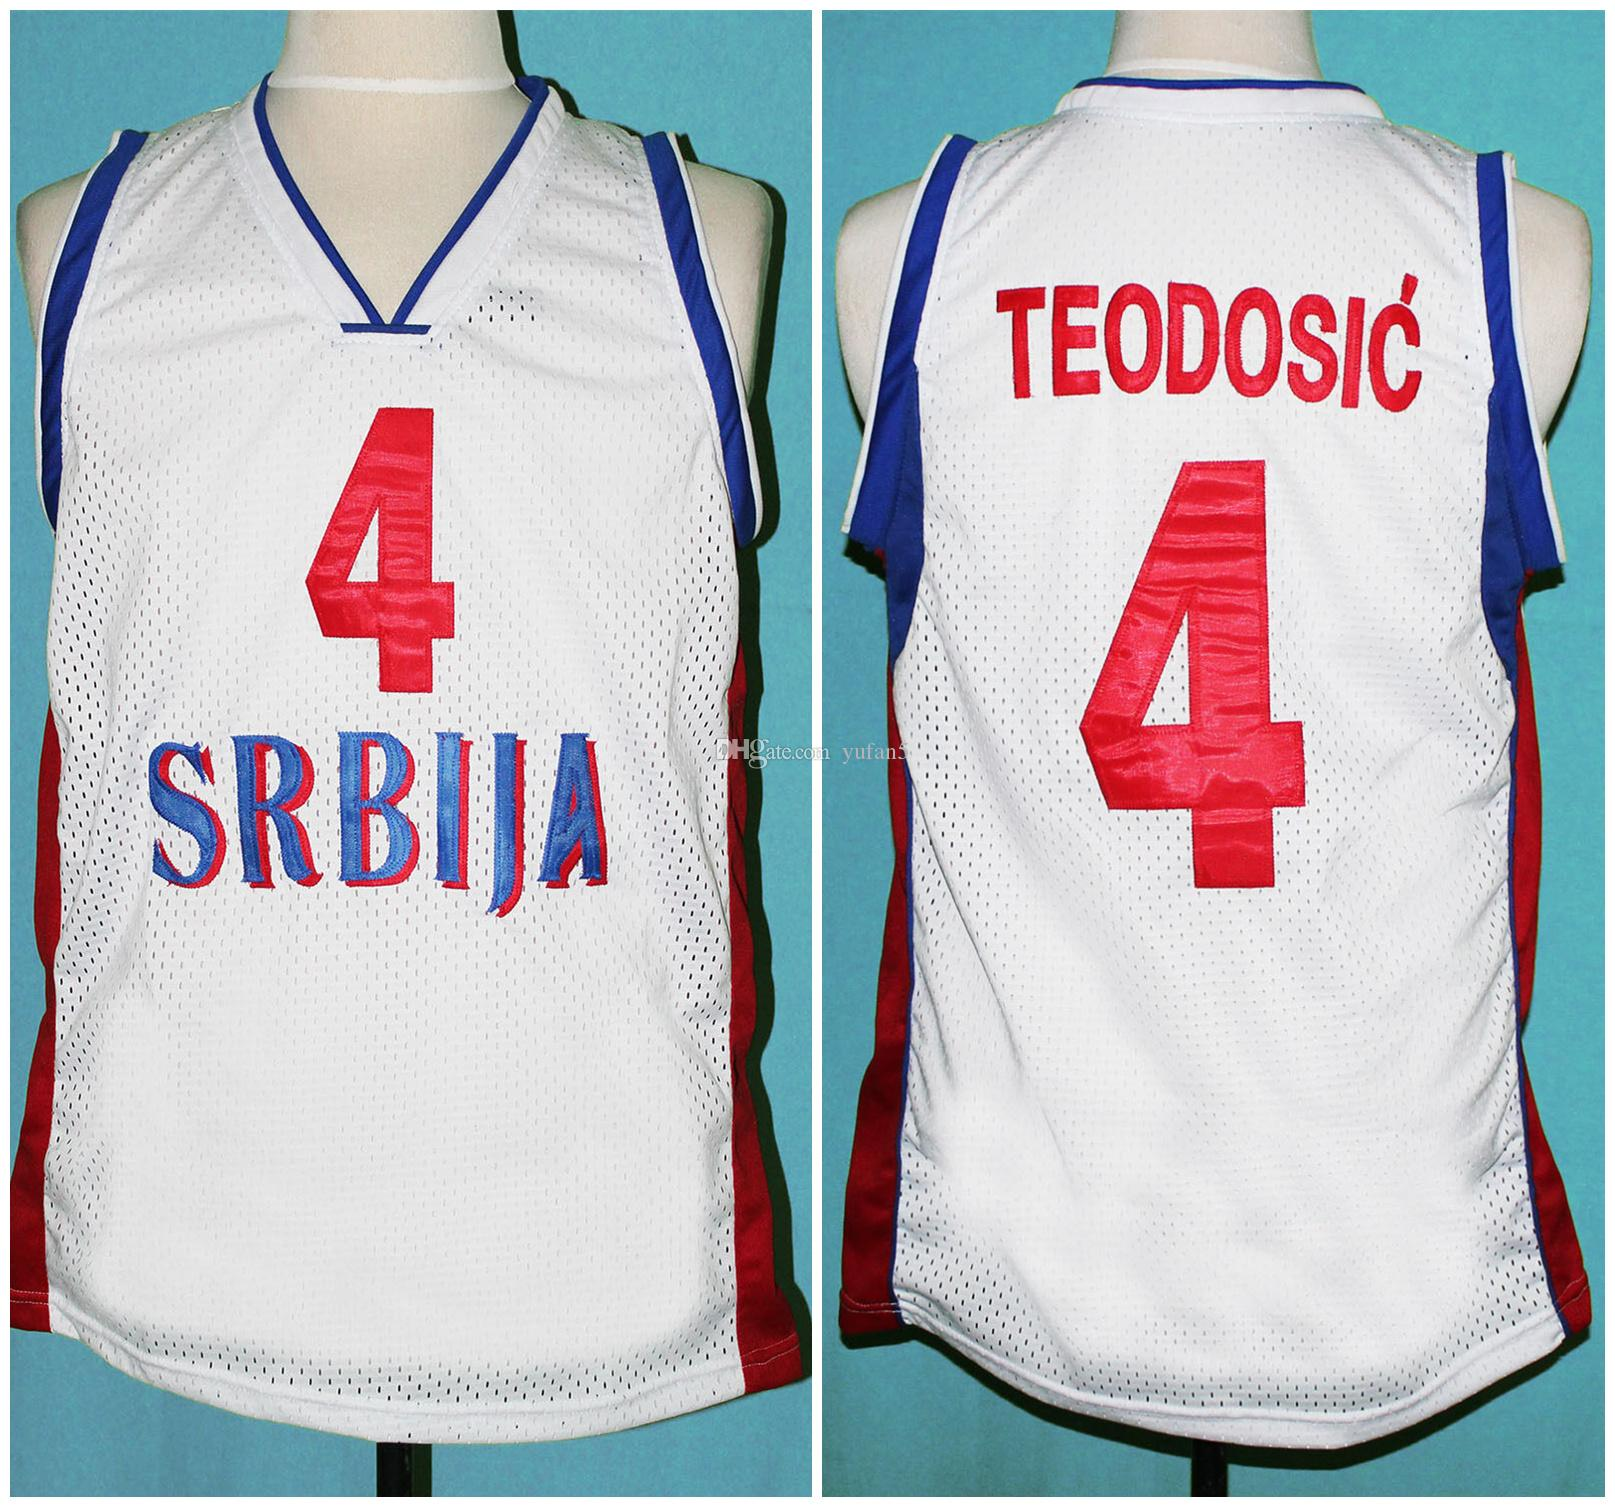 Serbia Teodosic4 Srbija 2019 Team Retro Jerseys Basketball Milos gvf7bY6y